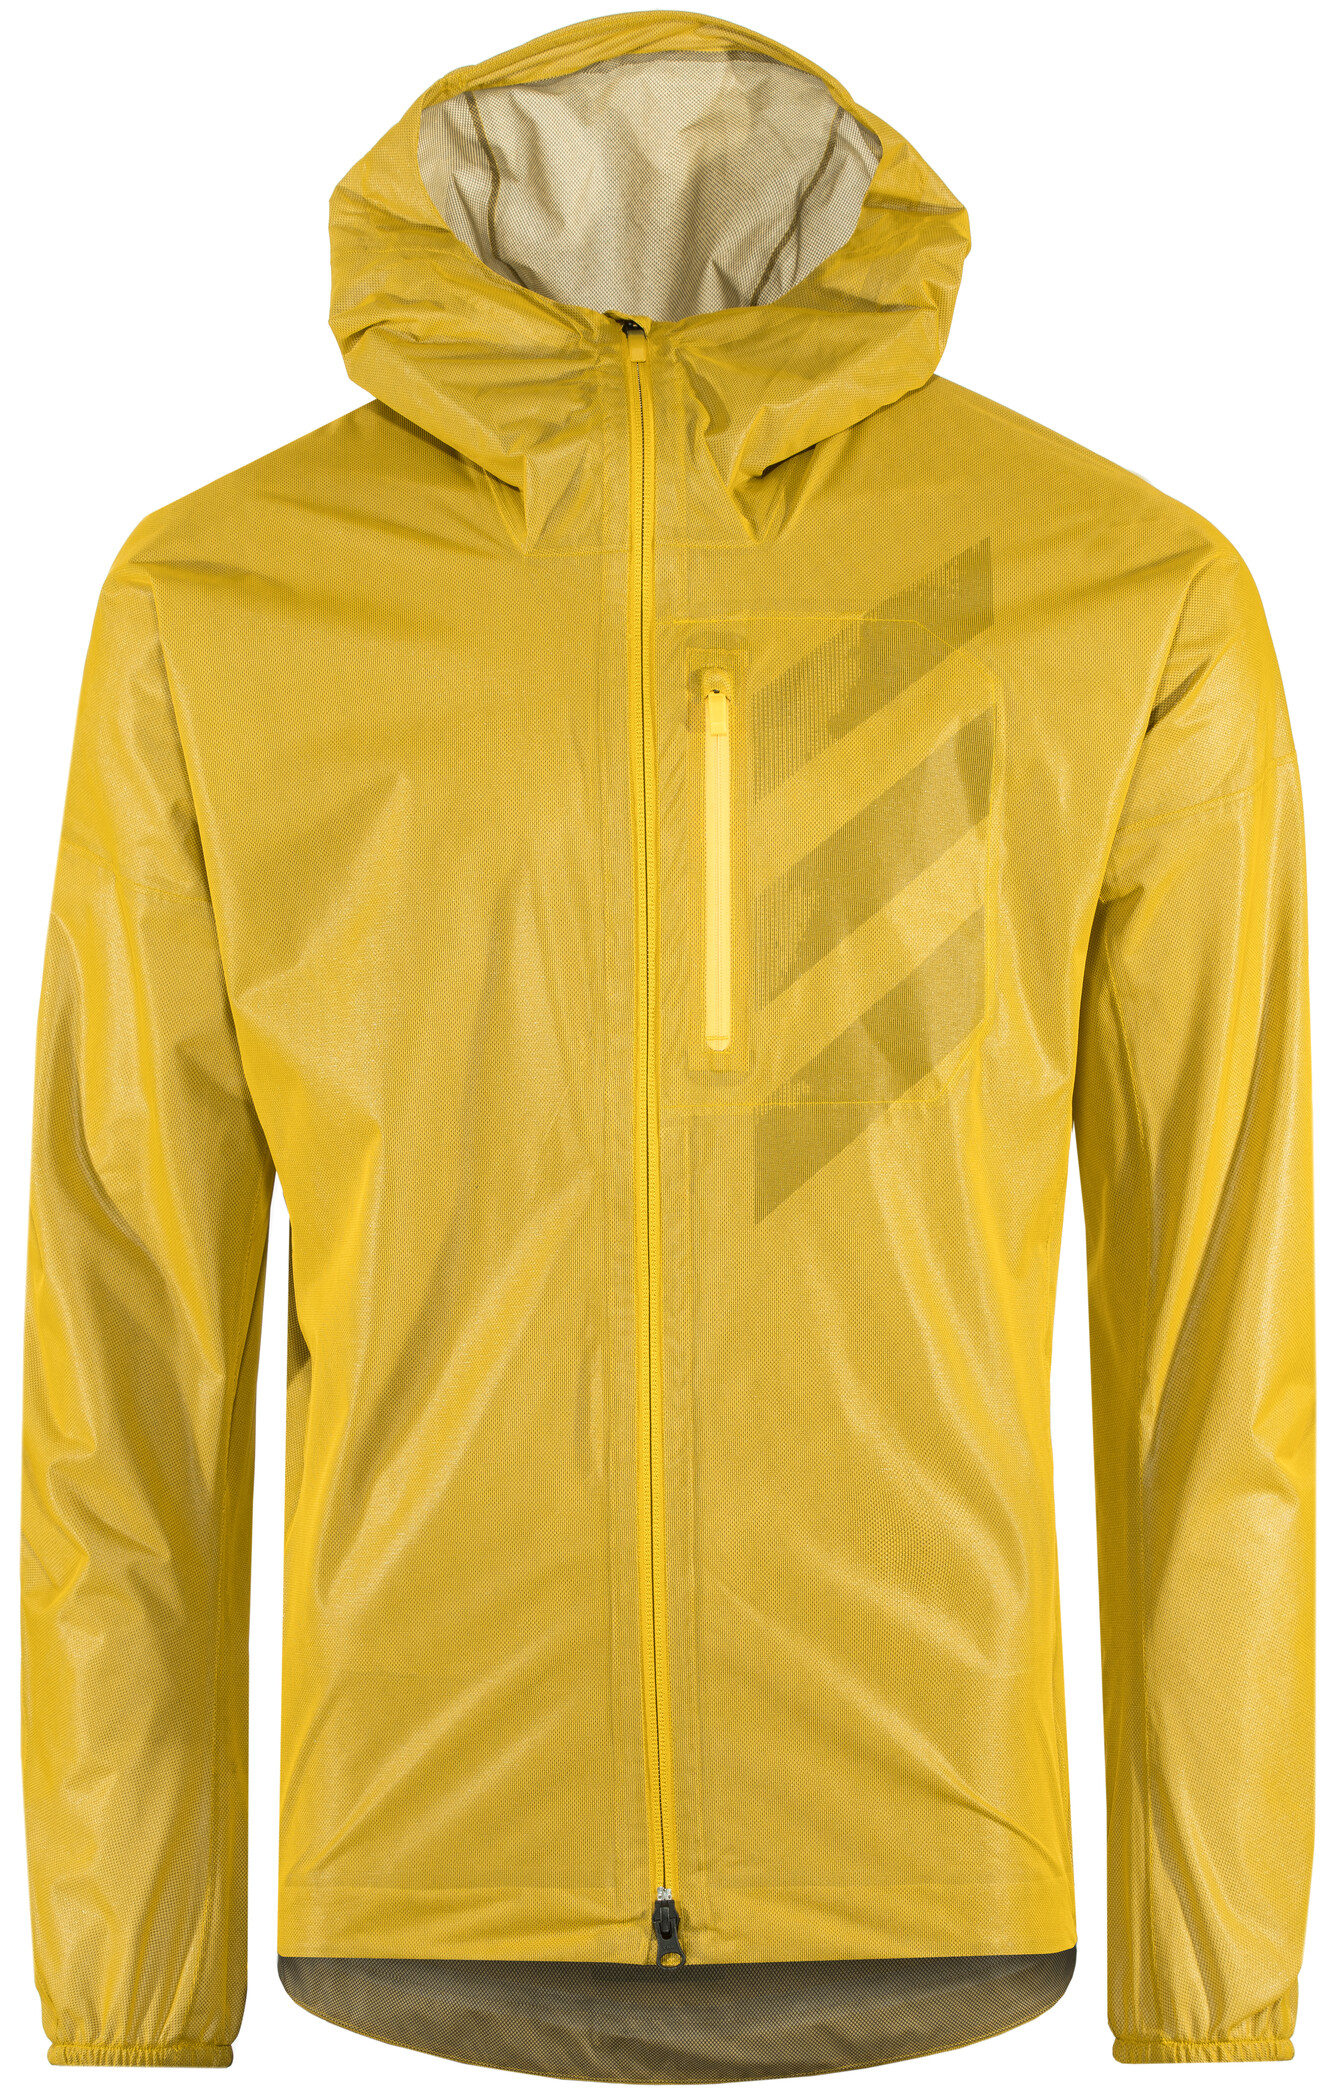 Adidas Terrex Agravic 3L ab 176,99 € | Preisvergleich bei